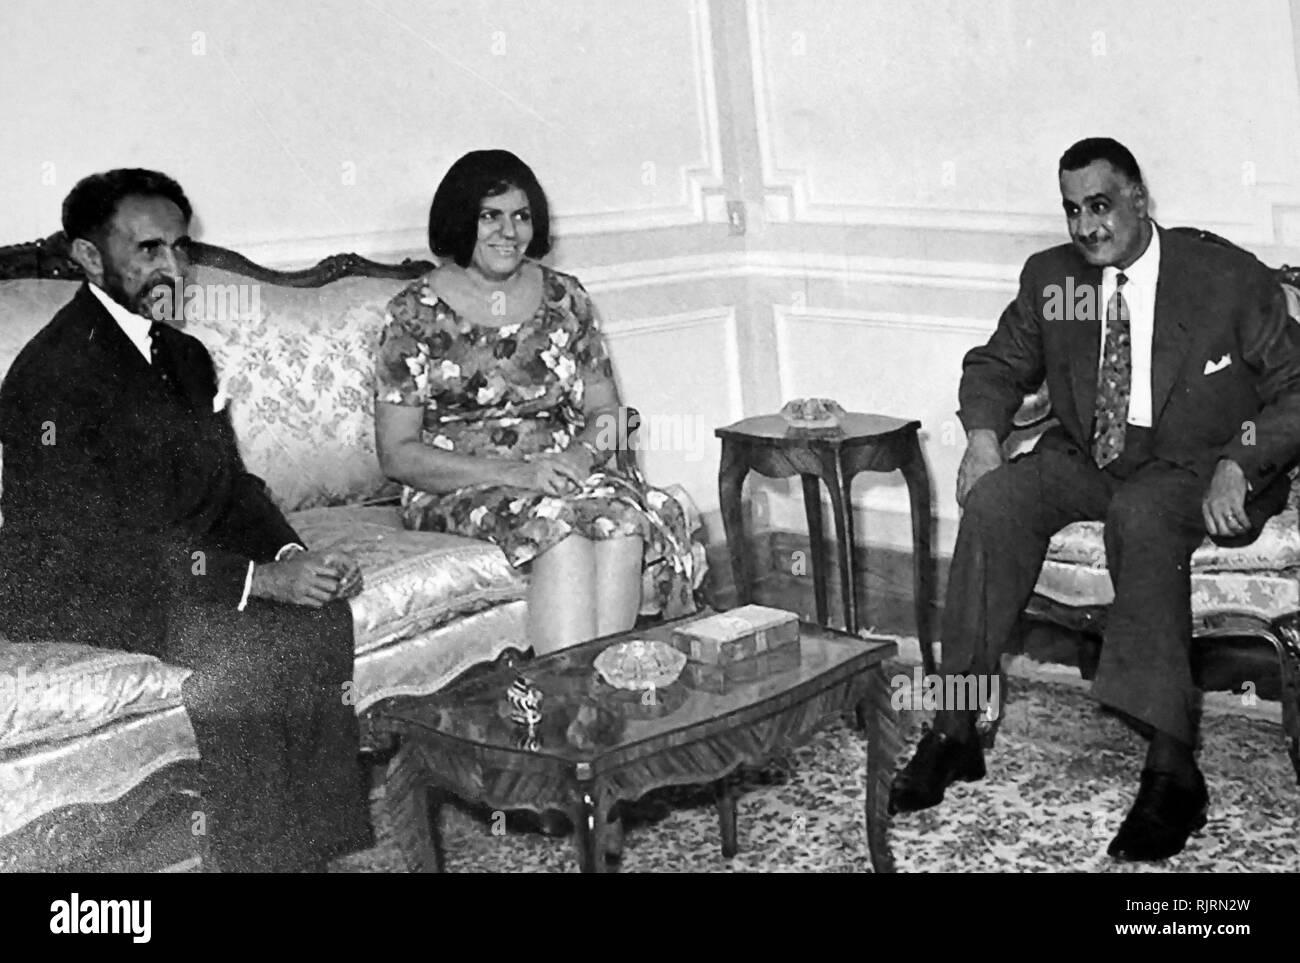 President Gamal Nasser of Egypt with Haile Selassie Emperor of Ethiopia. 1965 - Stock Image